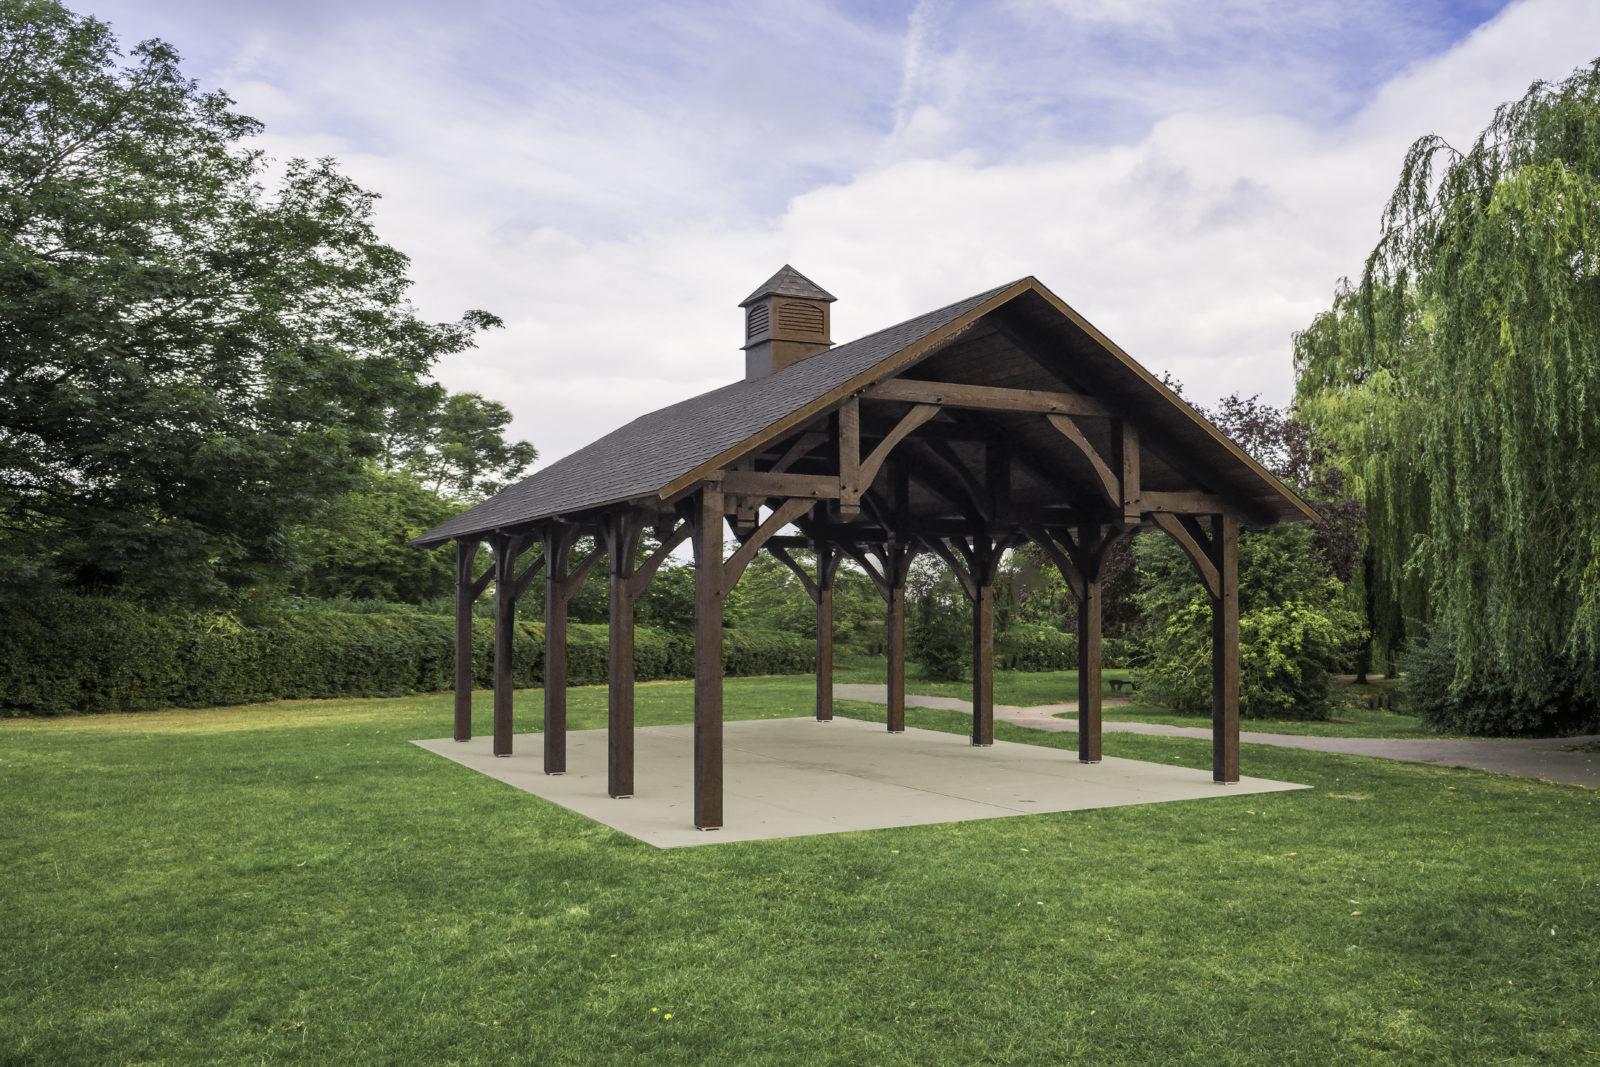 The Denali Pavilion